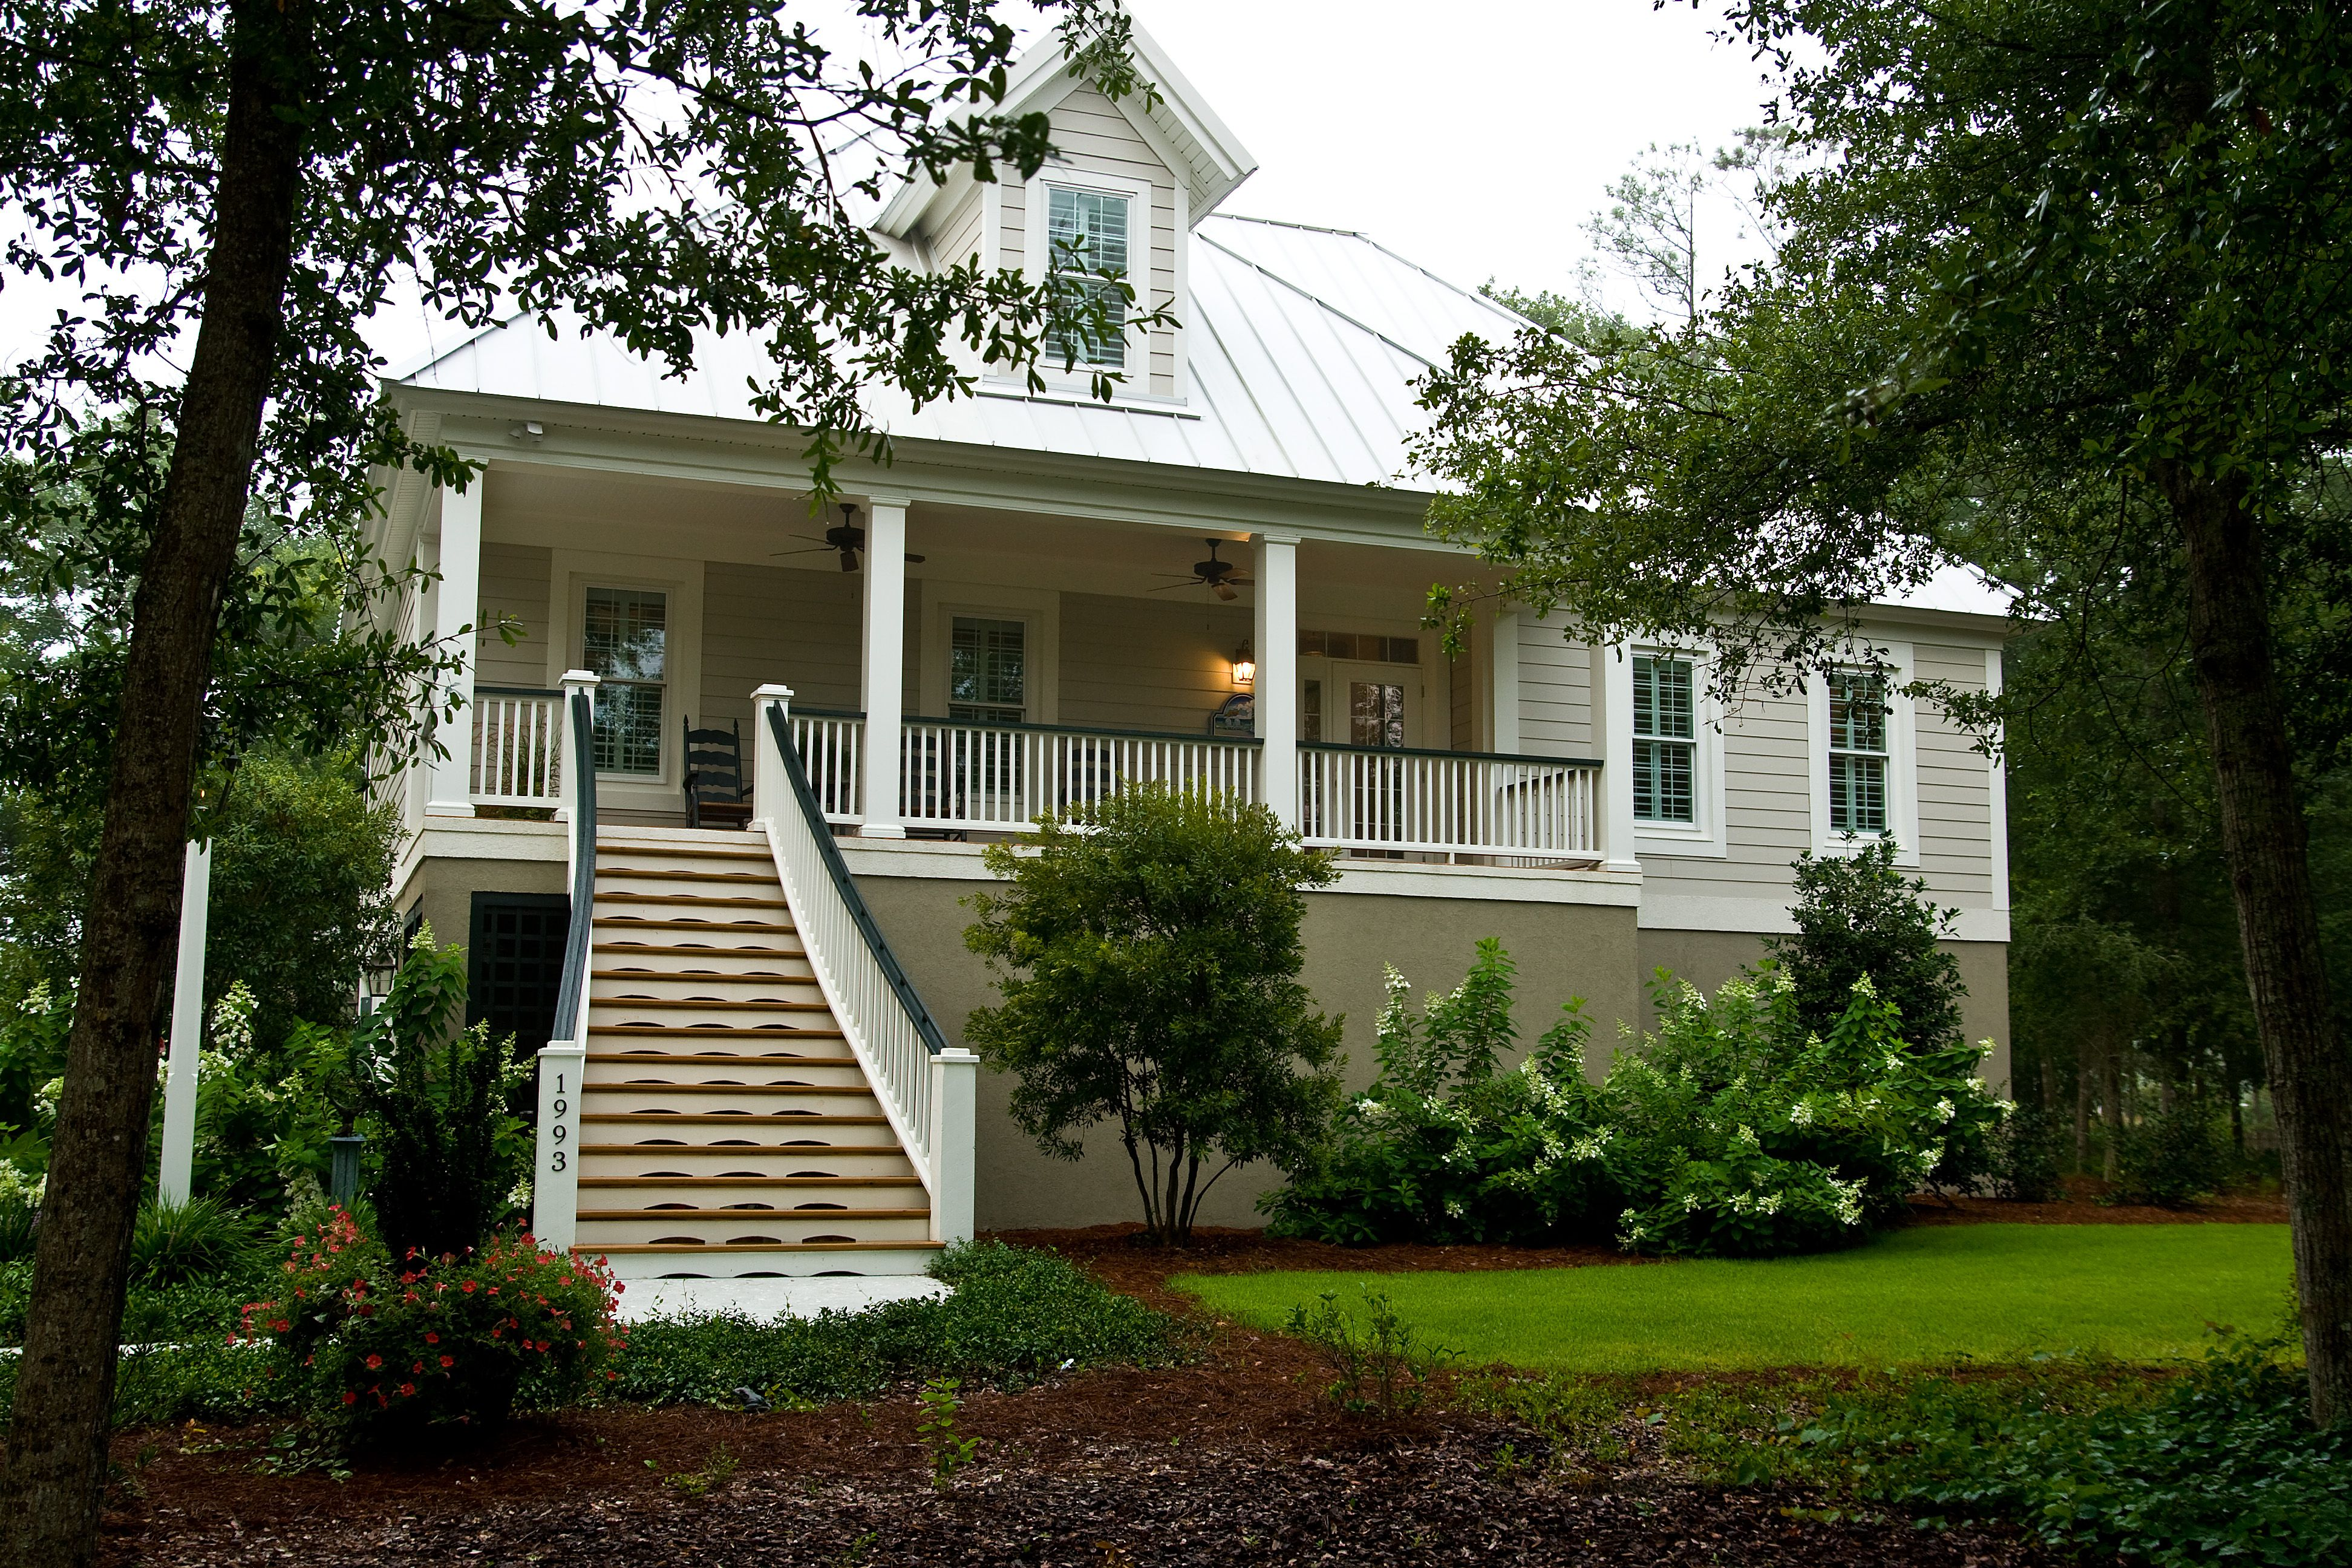 Front Elevation Cottage : Tradewind court house plan cottage front